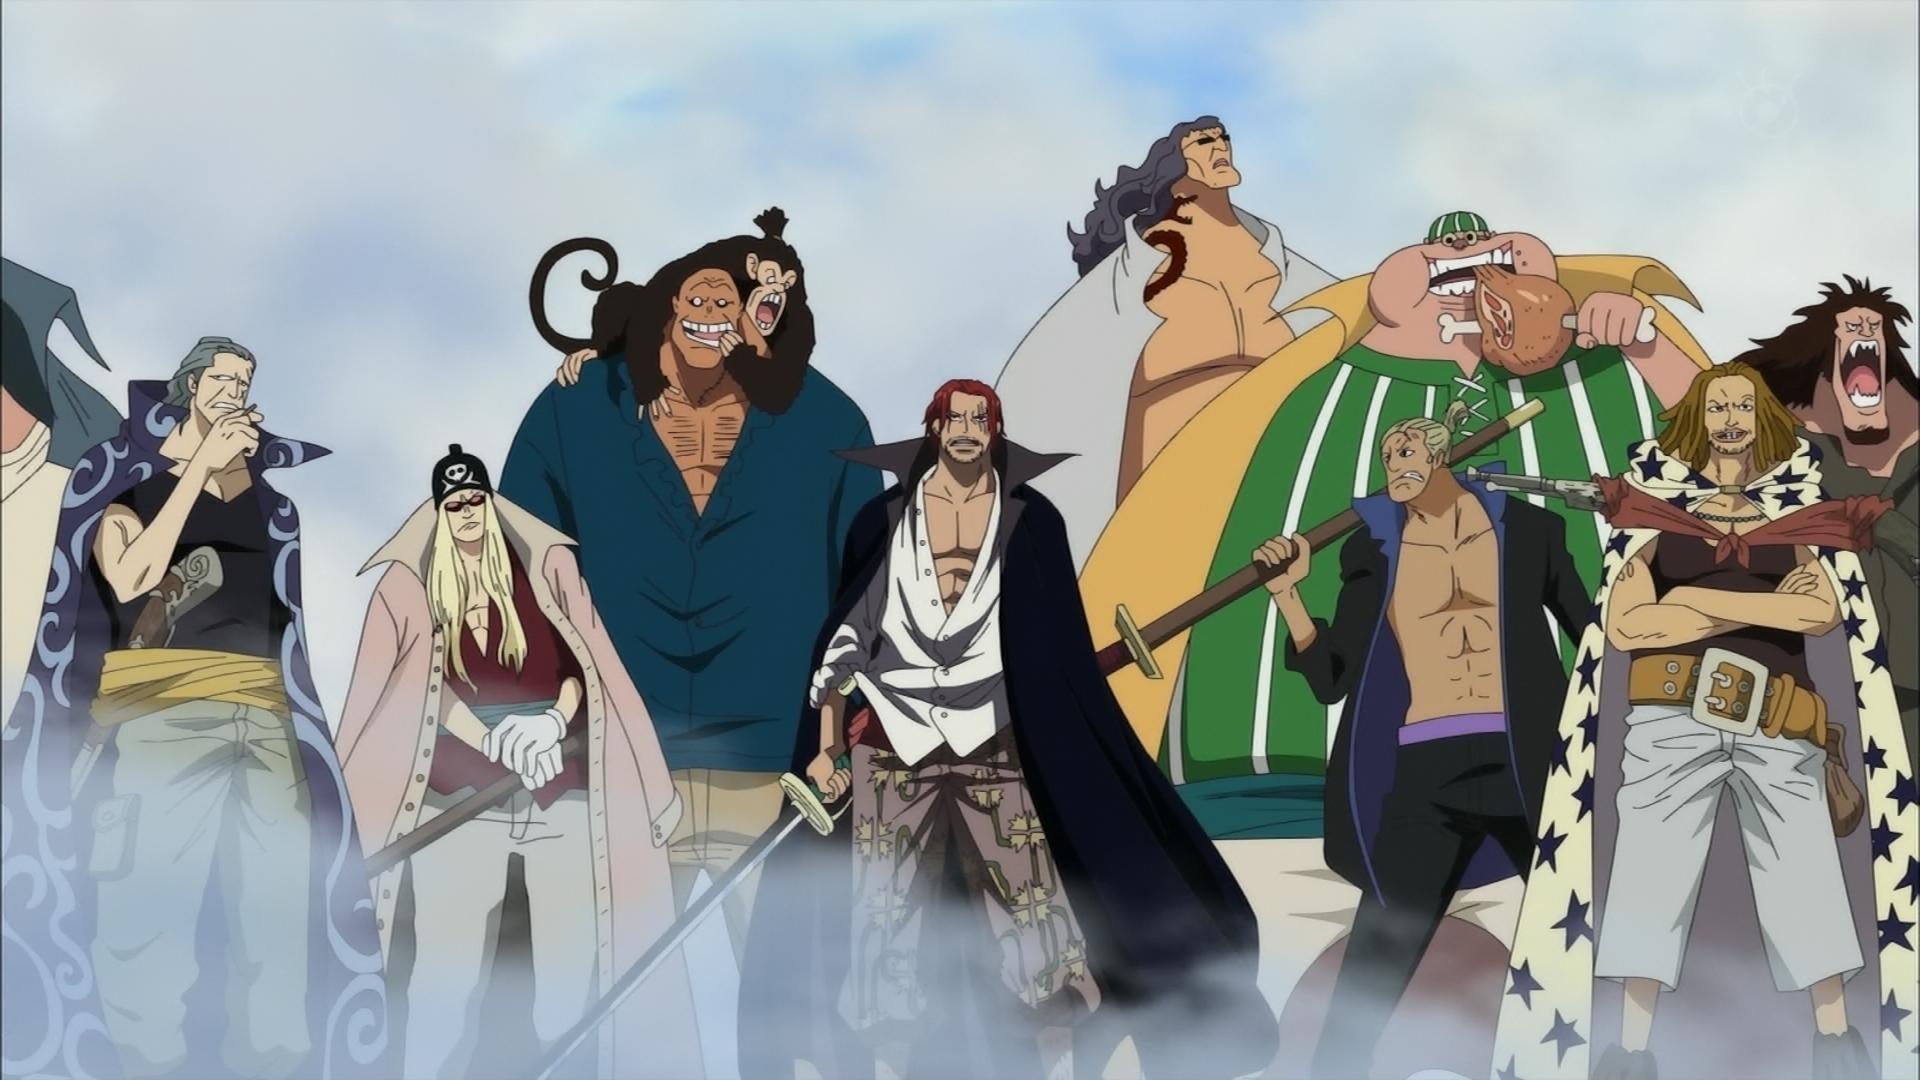 One Piece anime pirates Shanks wallpaper 1920x1080 218717 1920x1080